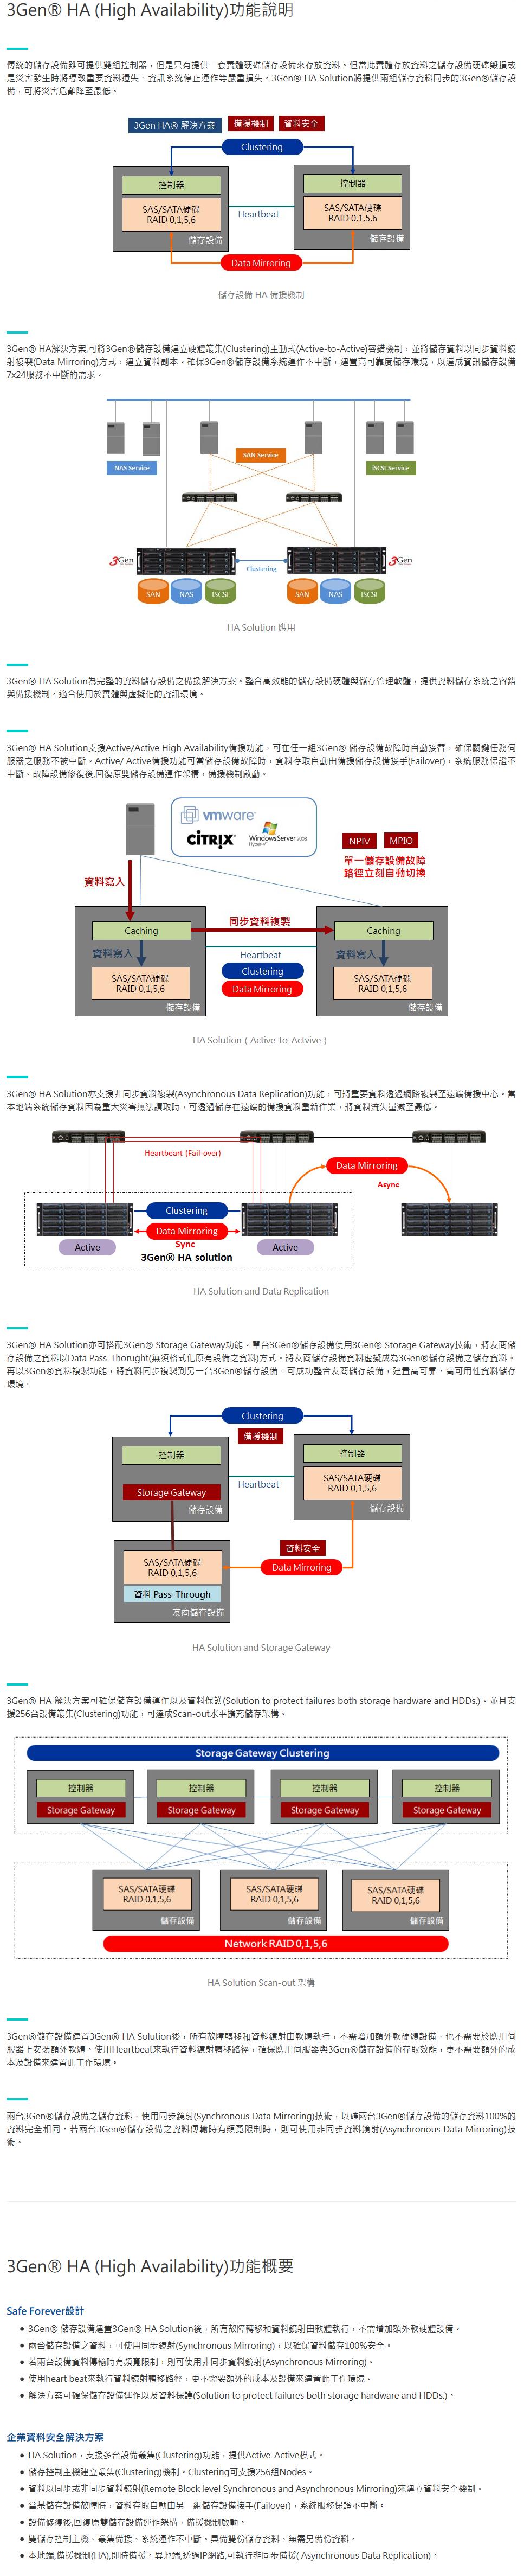 Screenshot_2019-05-18 樂高電腦股份有限公司(2).png